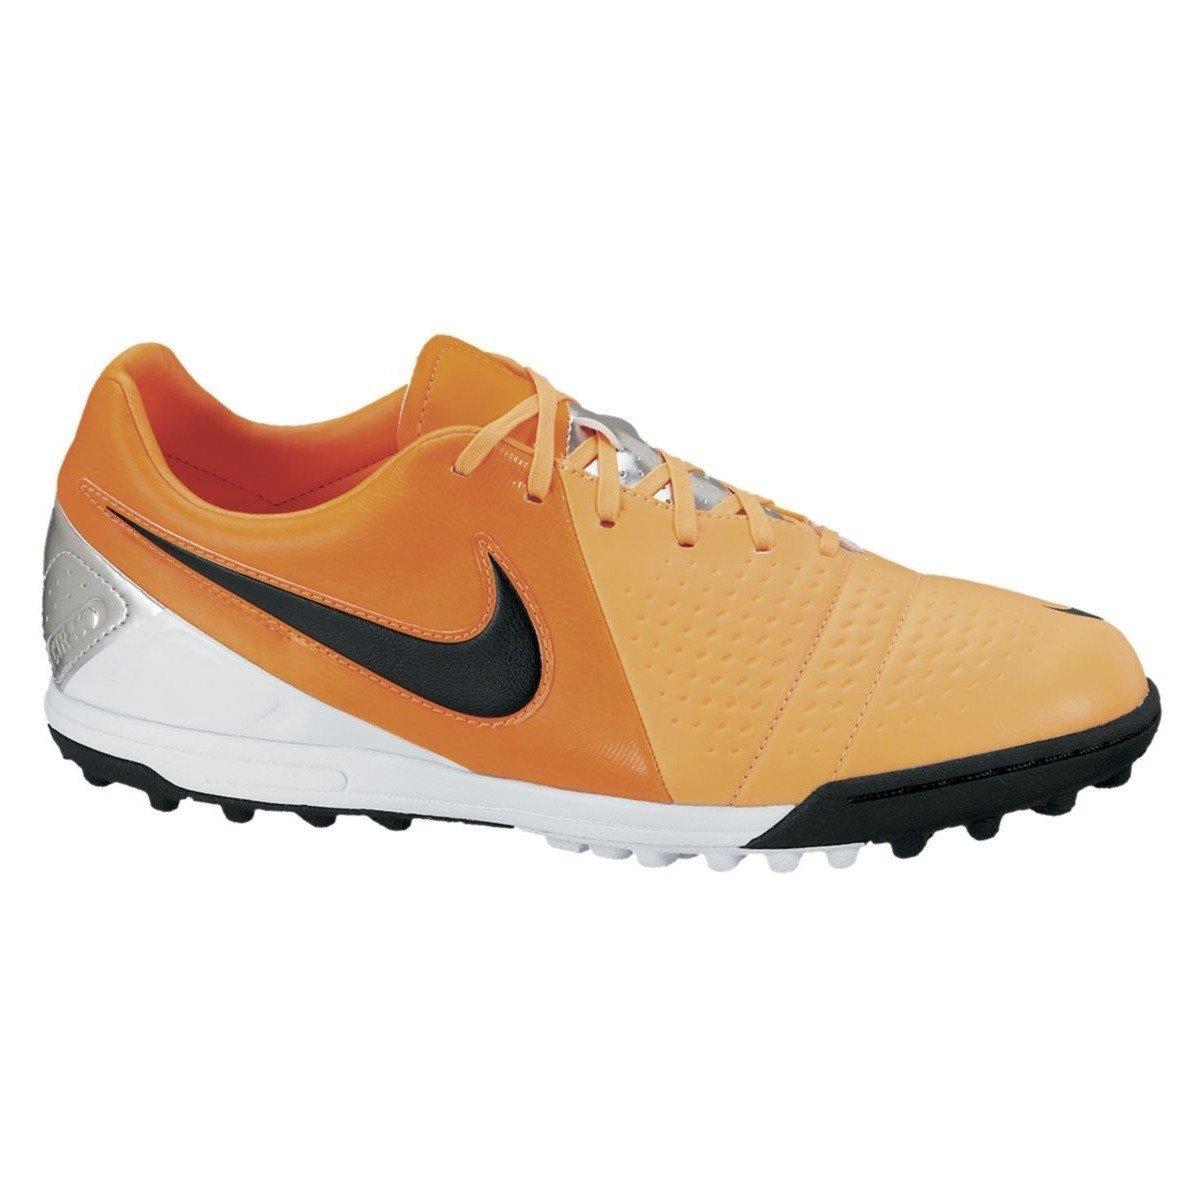 c917862059b56b Sklep Buty Mn Sport Nike 800 Iii Ctr360 525169 Libretto Tf 4qwz6qU5 ...